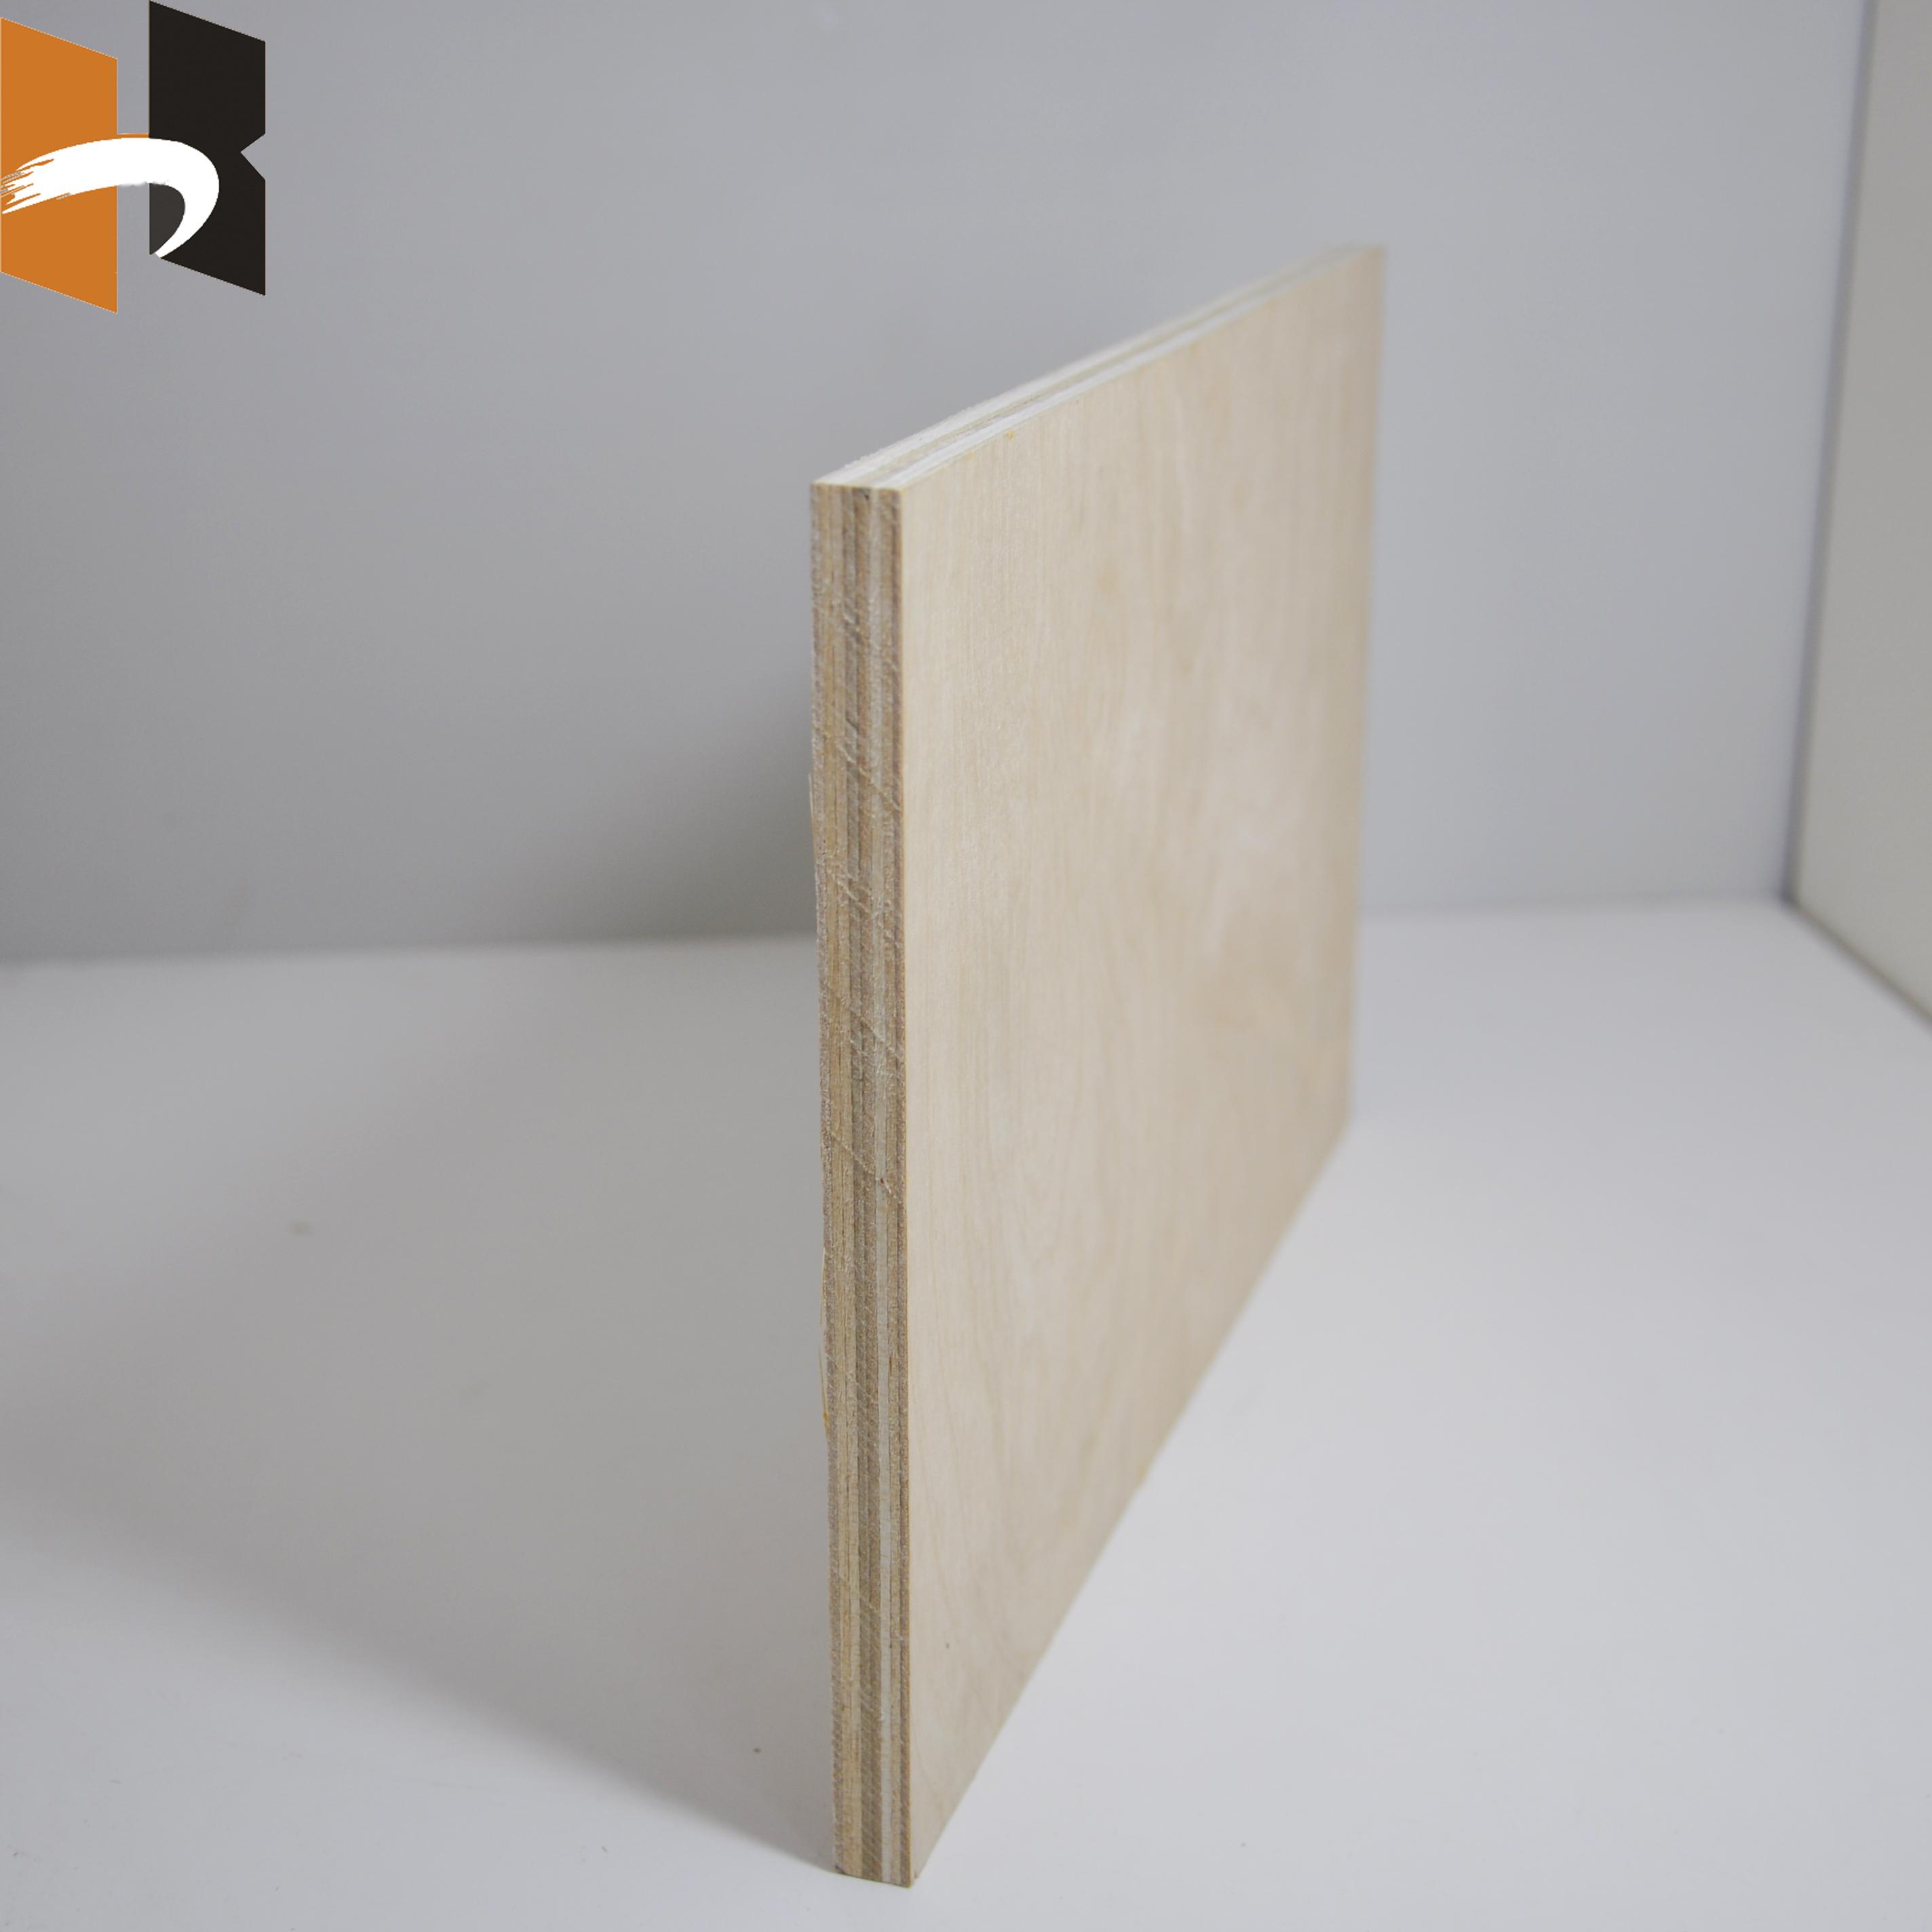 baltic birch plywood pro - HD2848×2848